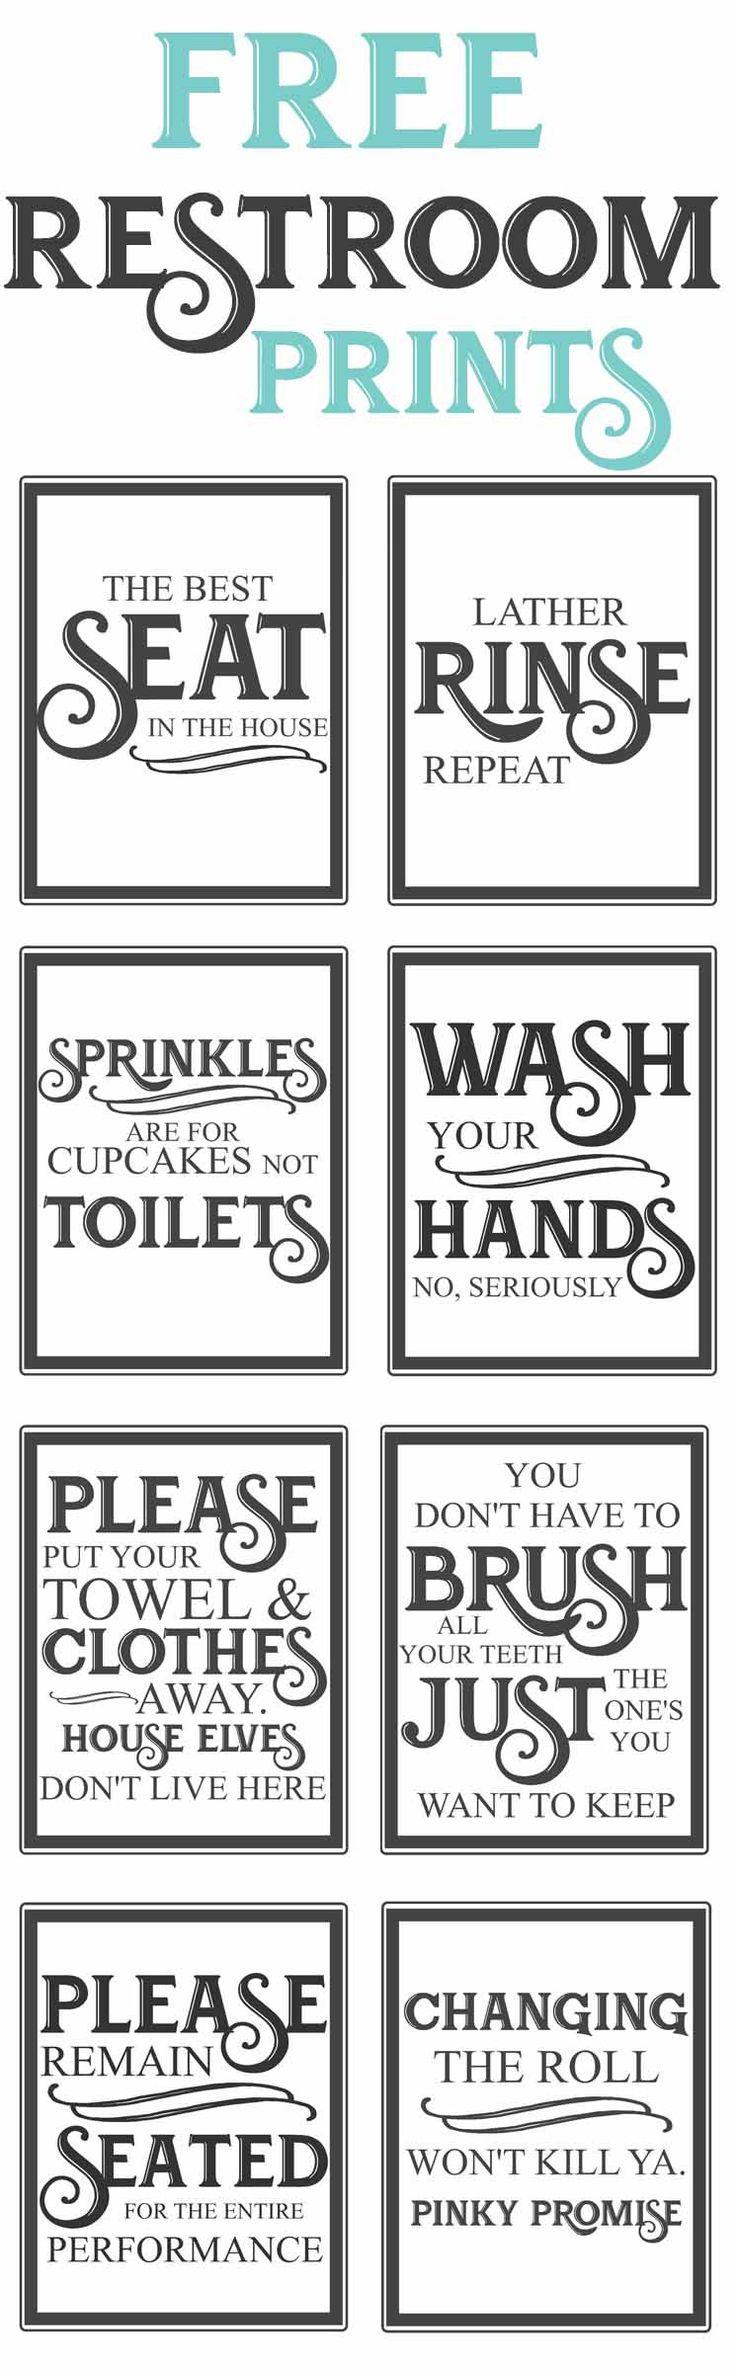 Free Vintage Bathroom Printables | Farmhouse | Diy Home Decor, Home - Free Printable Bathroom Pictures